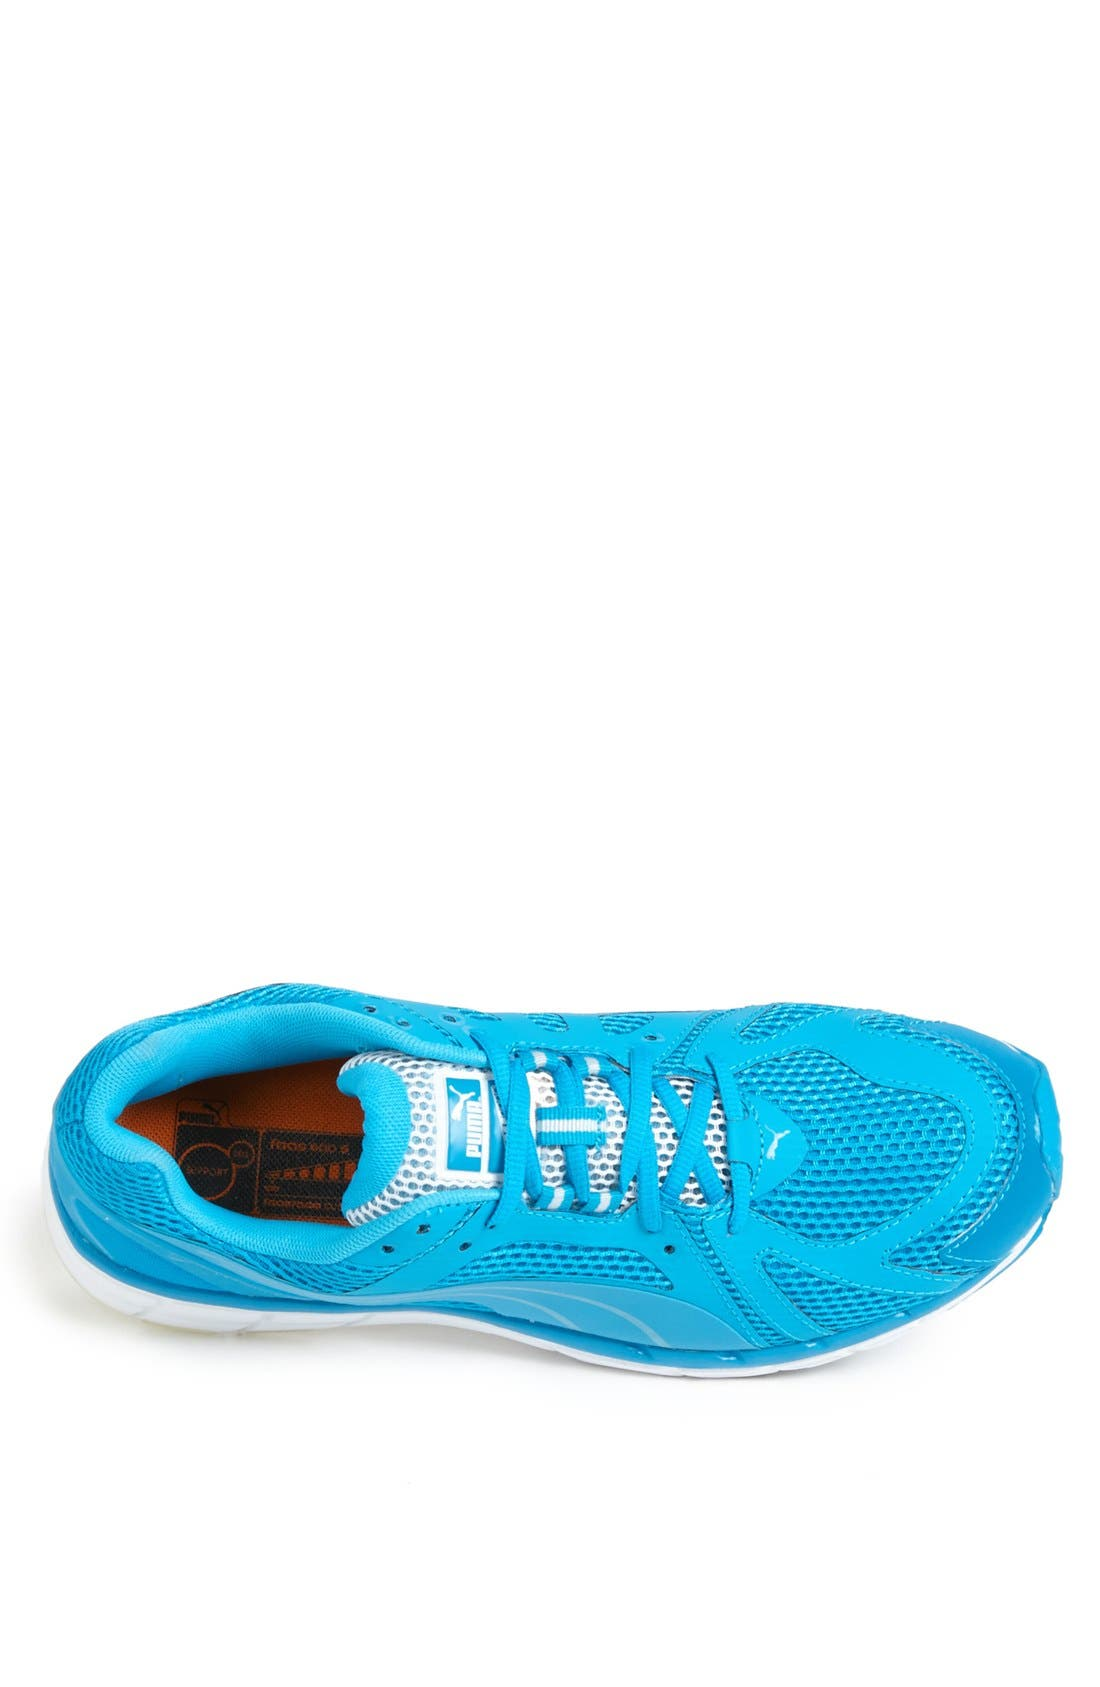 Alternate Image 3  - PUMA 'Faas 600 S Glow' Running Shoe (Men)